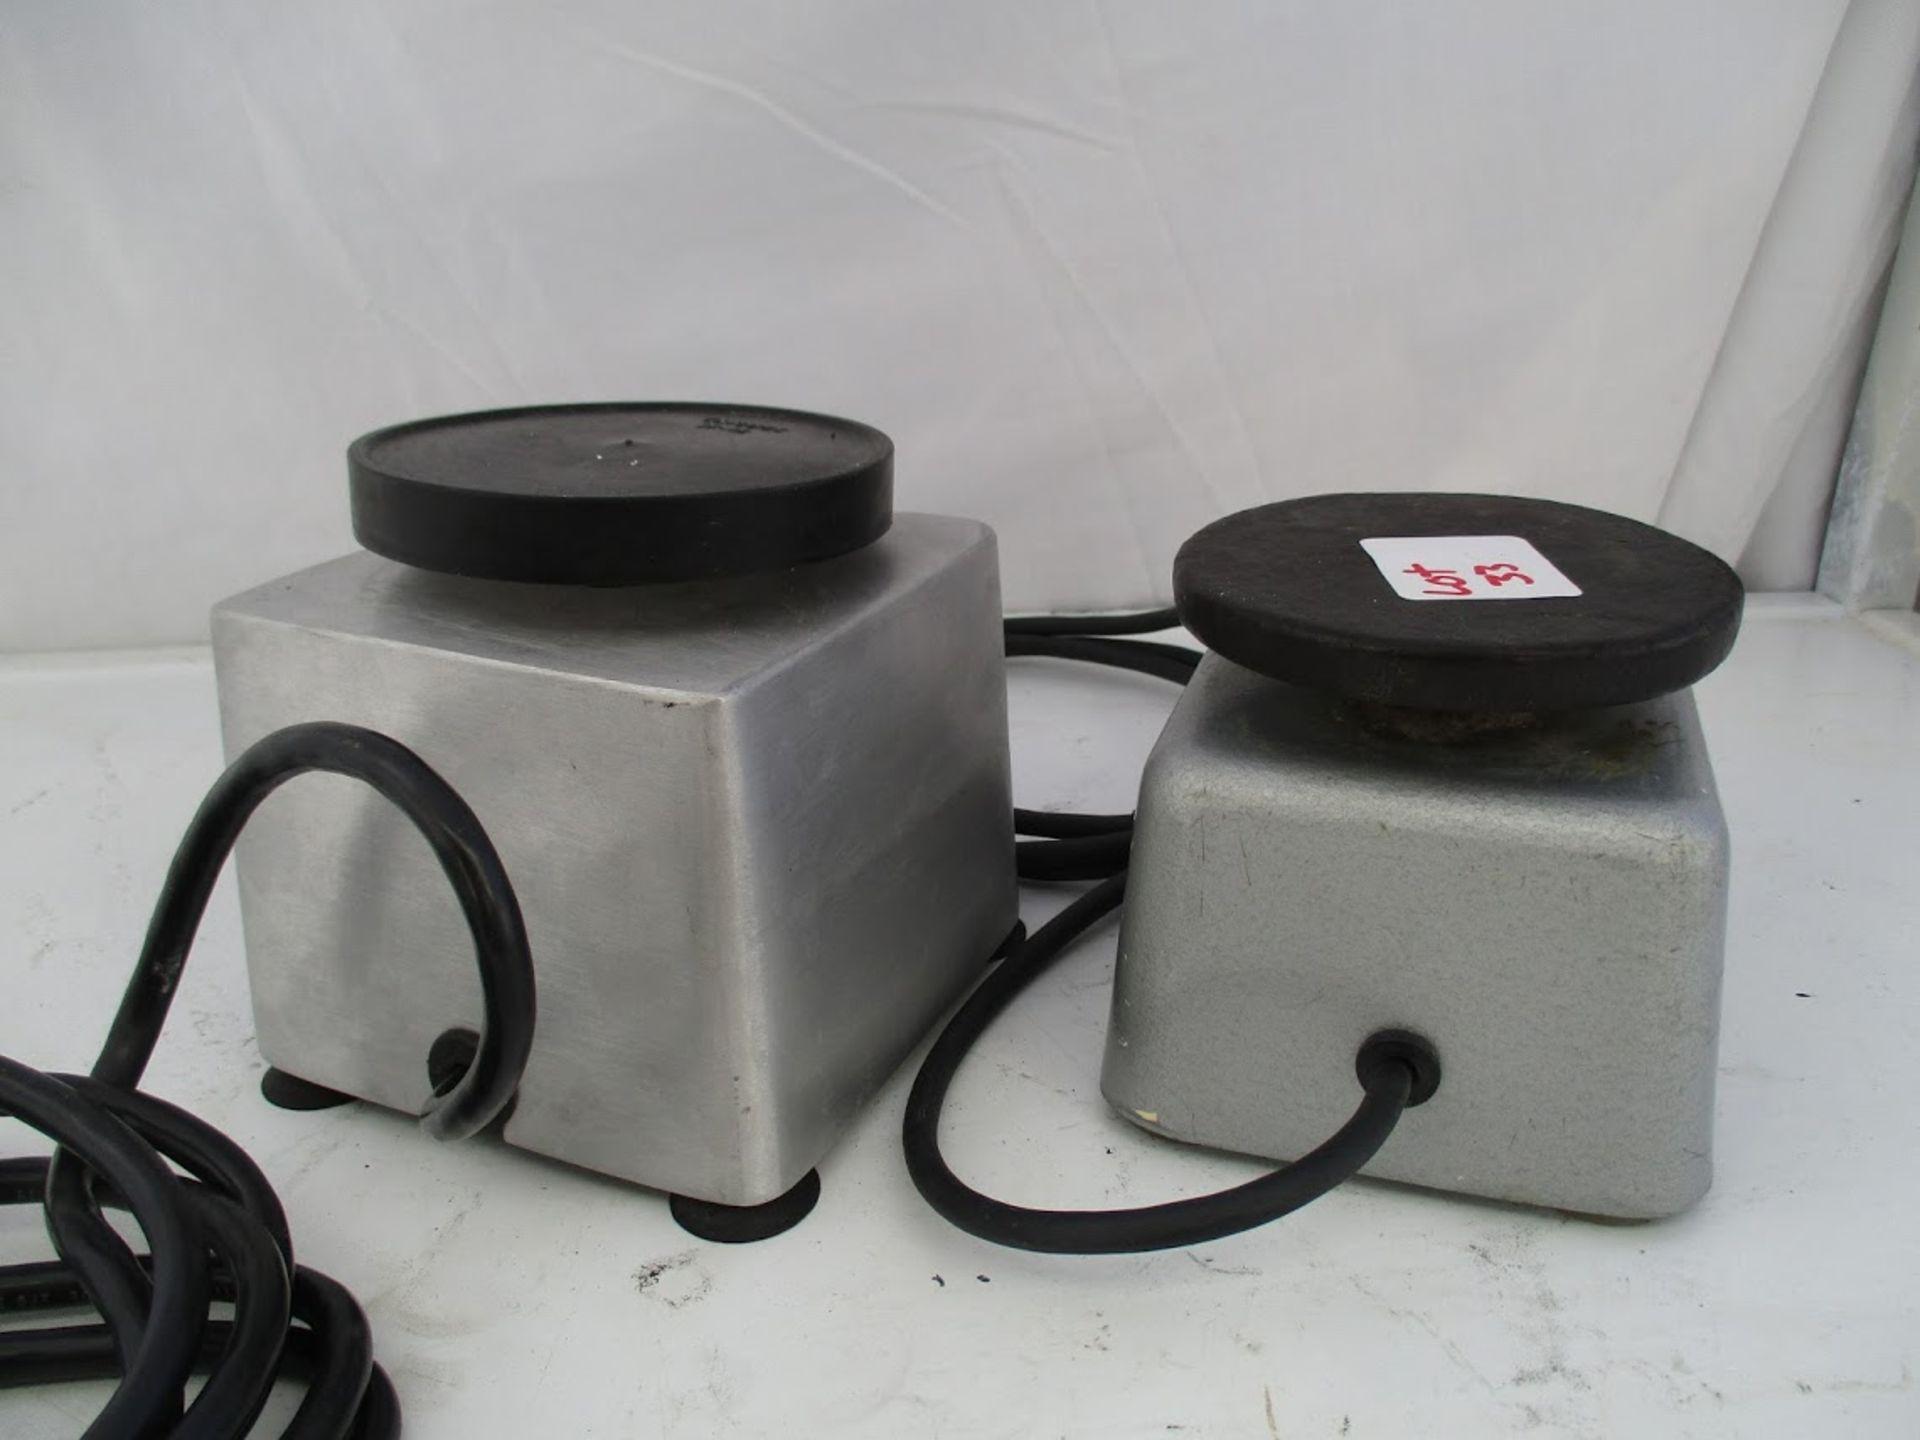 Patterson Dental Vibrator 150W 120V plus Toothmaster Model 6H Plaster Vibrator 31 watts, 115V - Image 2 of 2